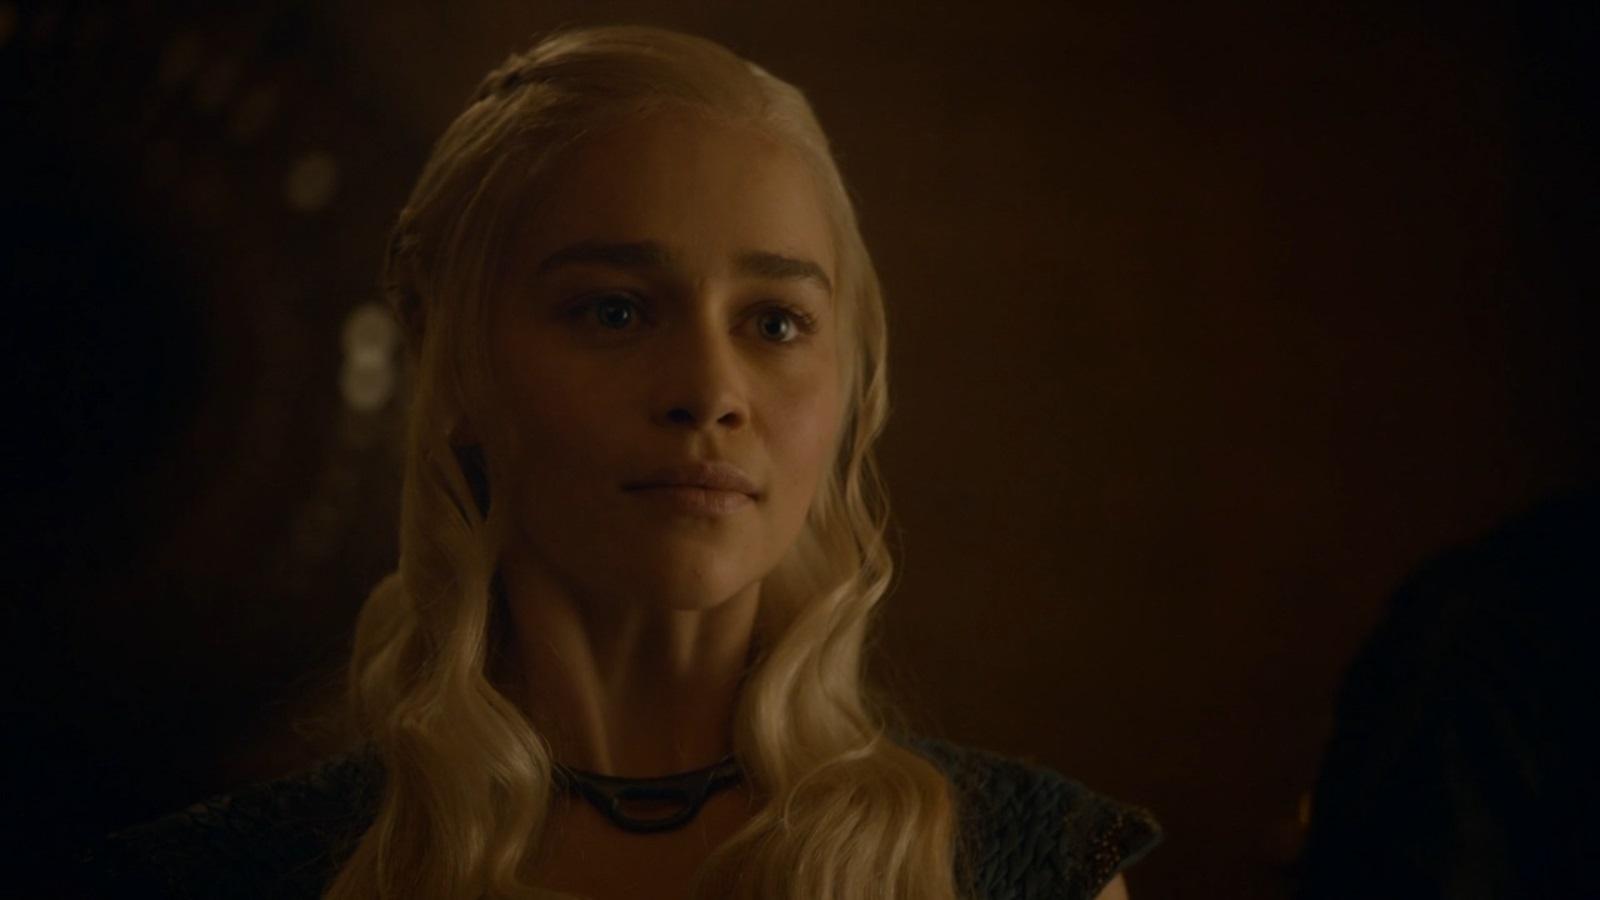 game of thrones season 3 episode 3 watch online